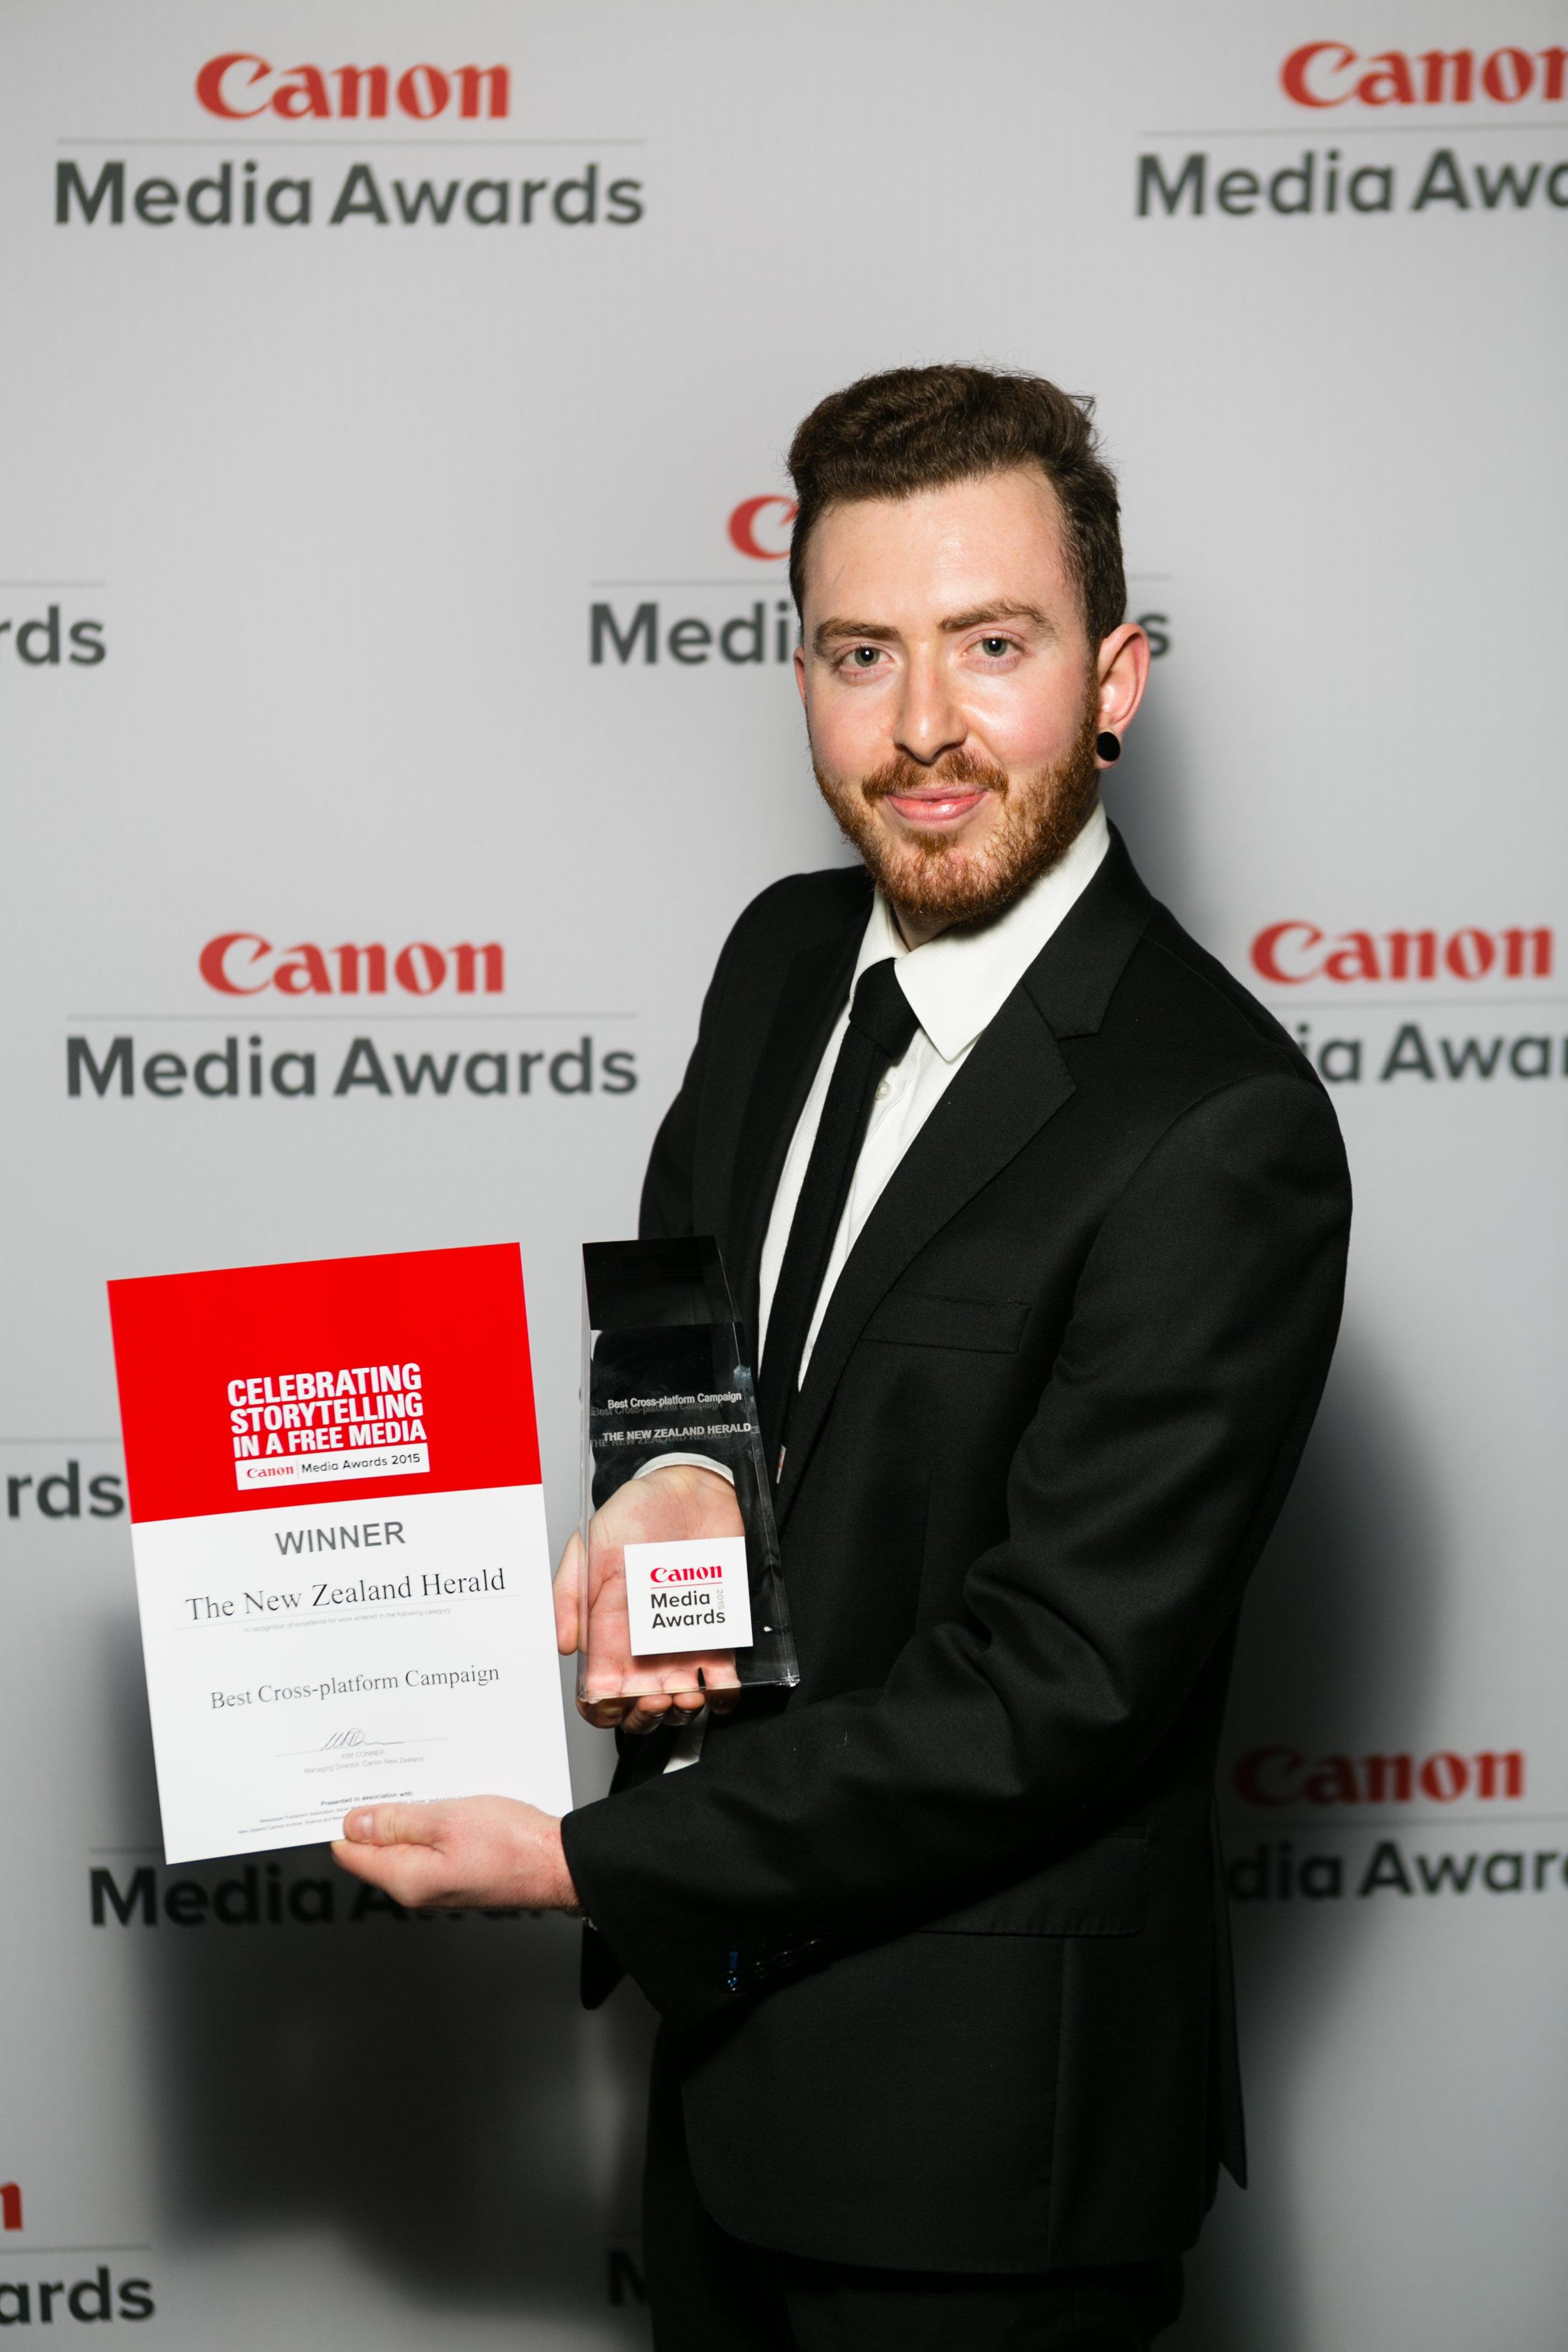 canon_media_awards_2015_interlike_nz_clinton_tudor-5953-199.jpg